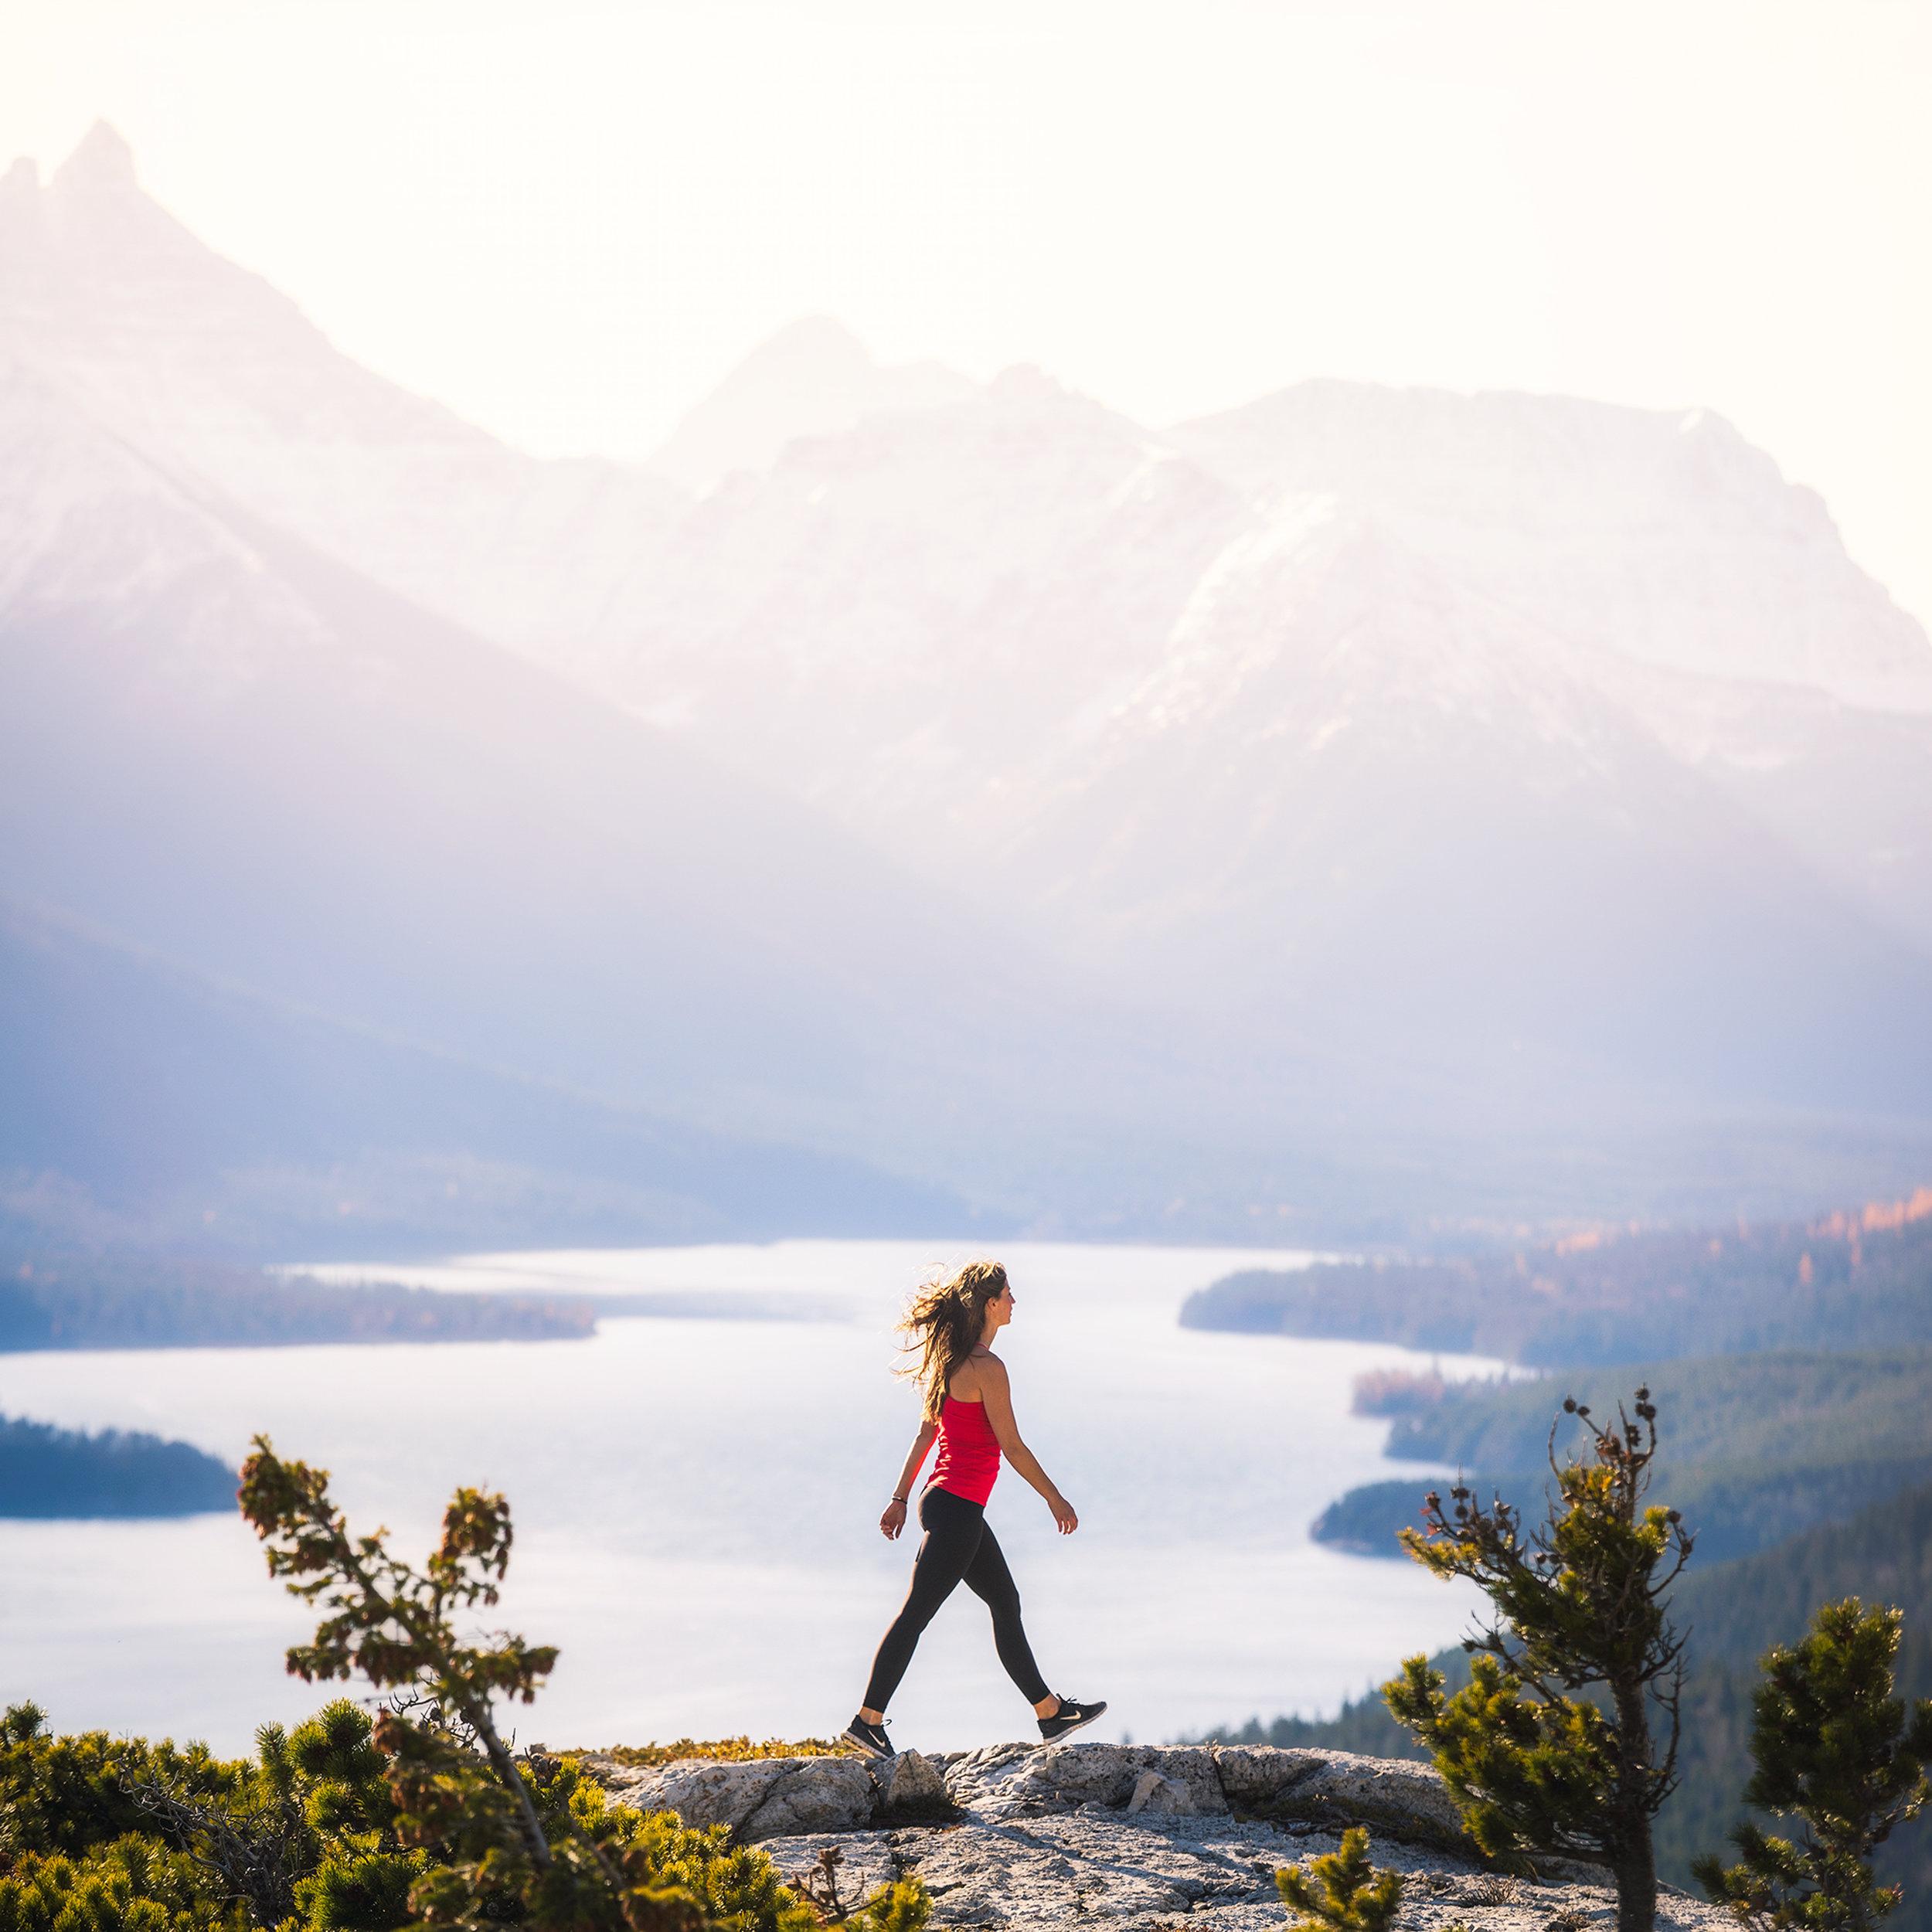 A autumn morning on Bear's Hump overlooking the lake, photo / Michael Matti